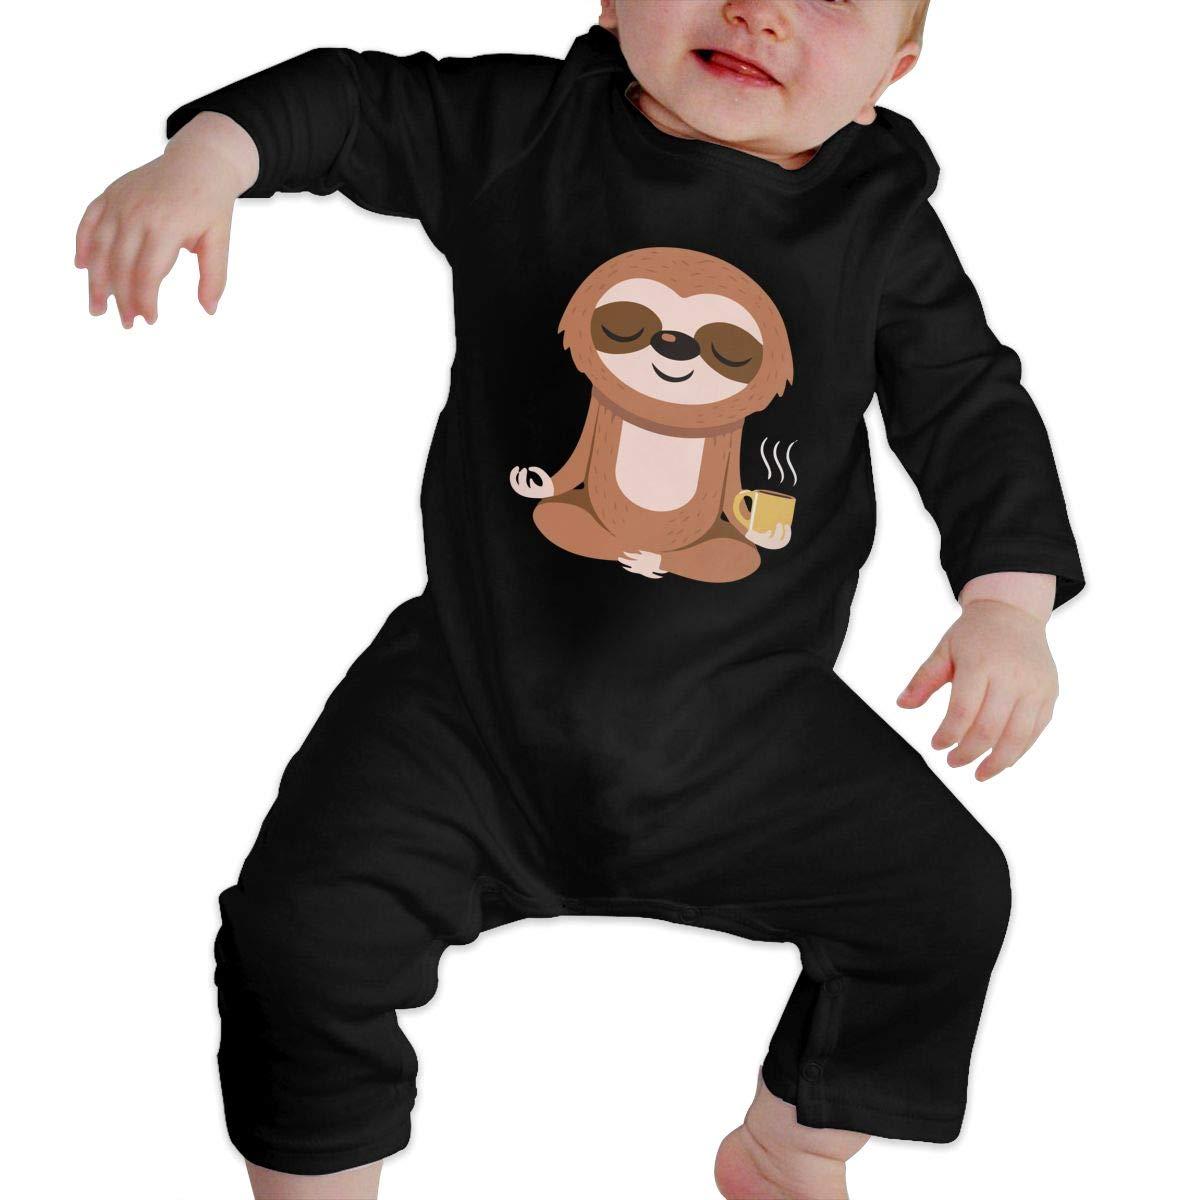 Amazon.com: XHAKZM71 Baby Boys Round Collar Yoga Sloth Long ...